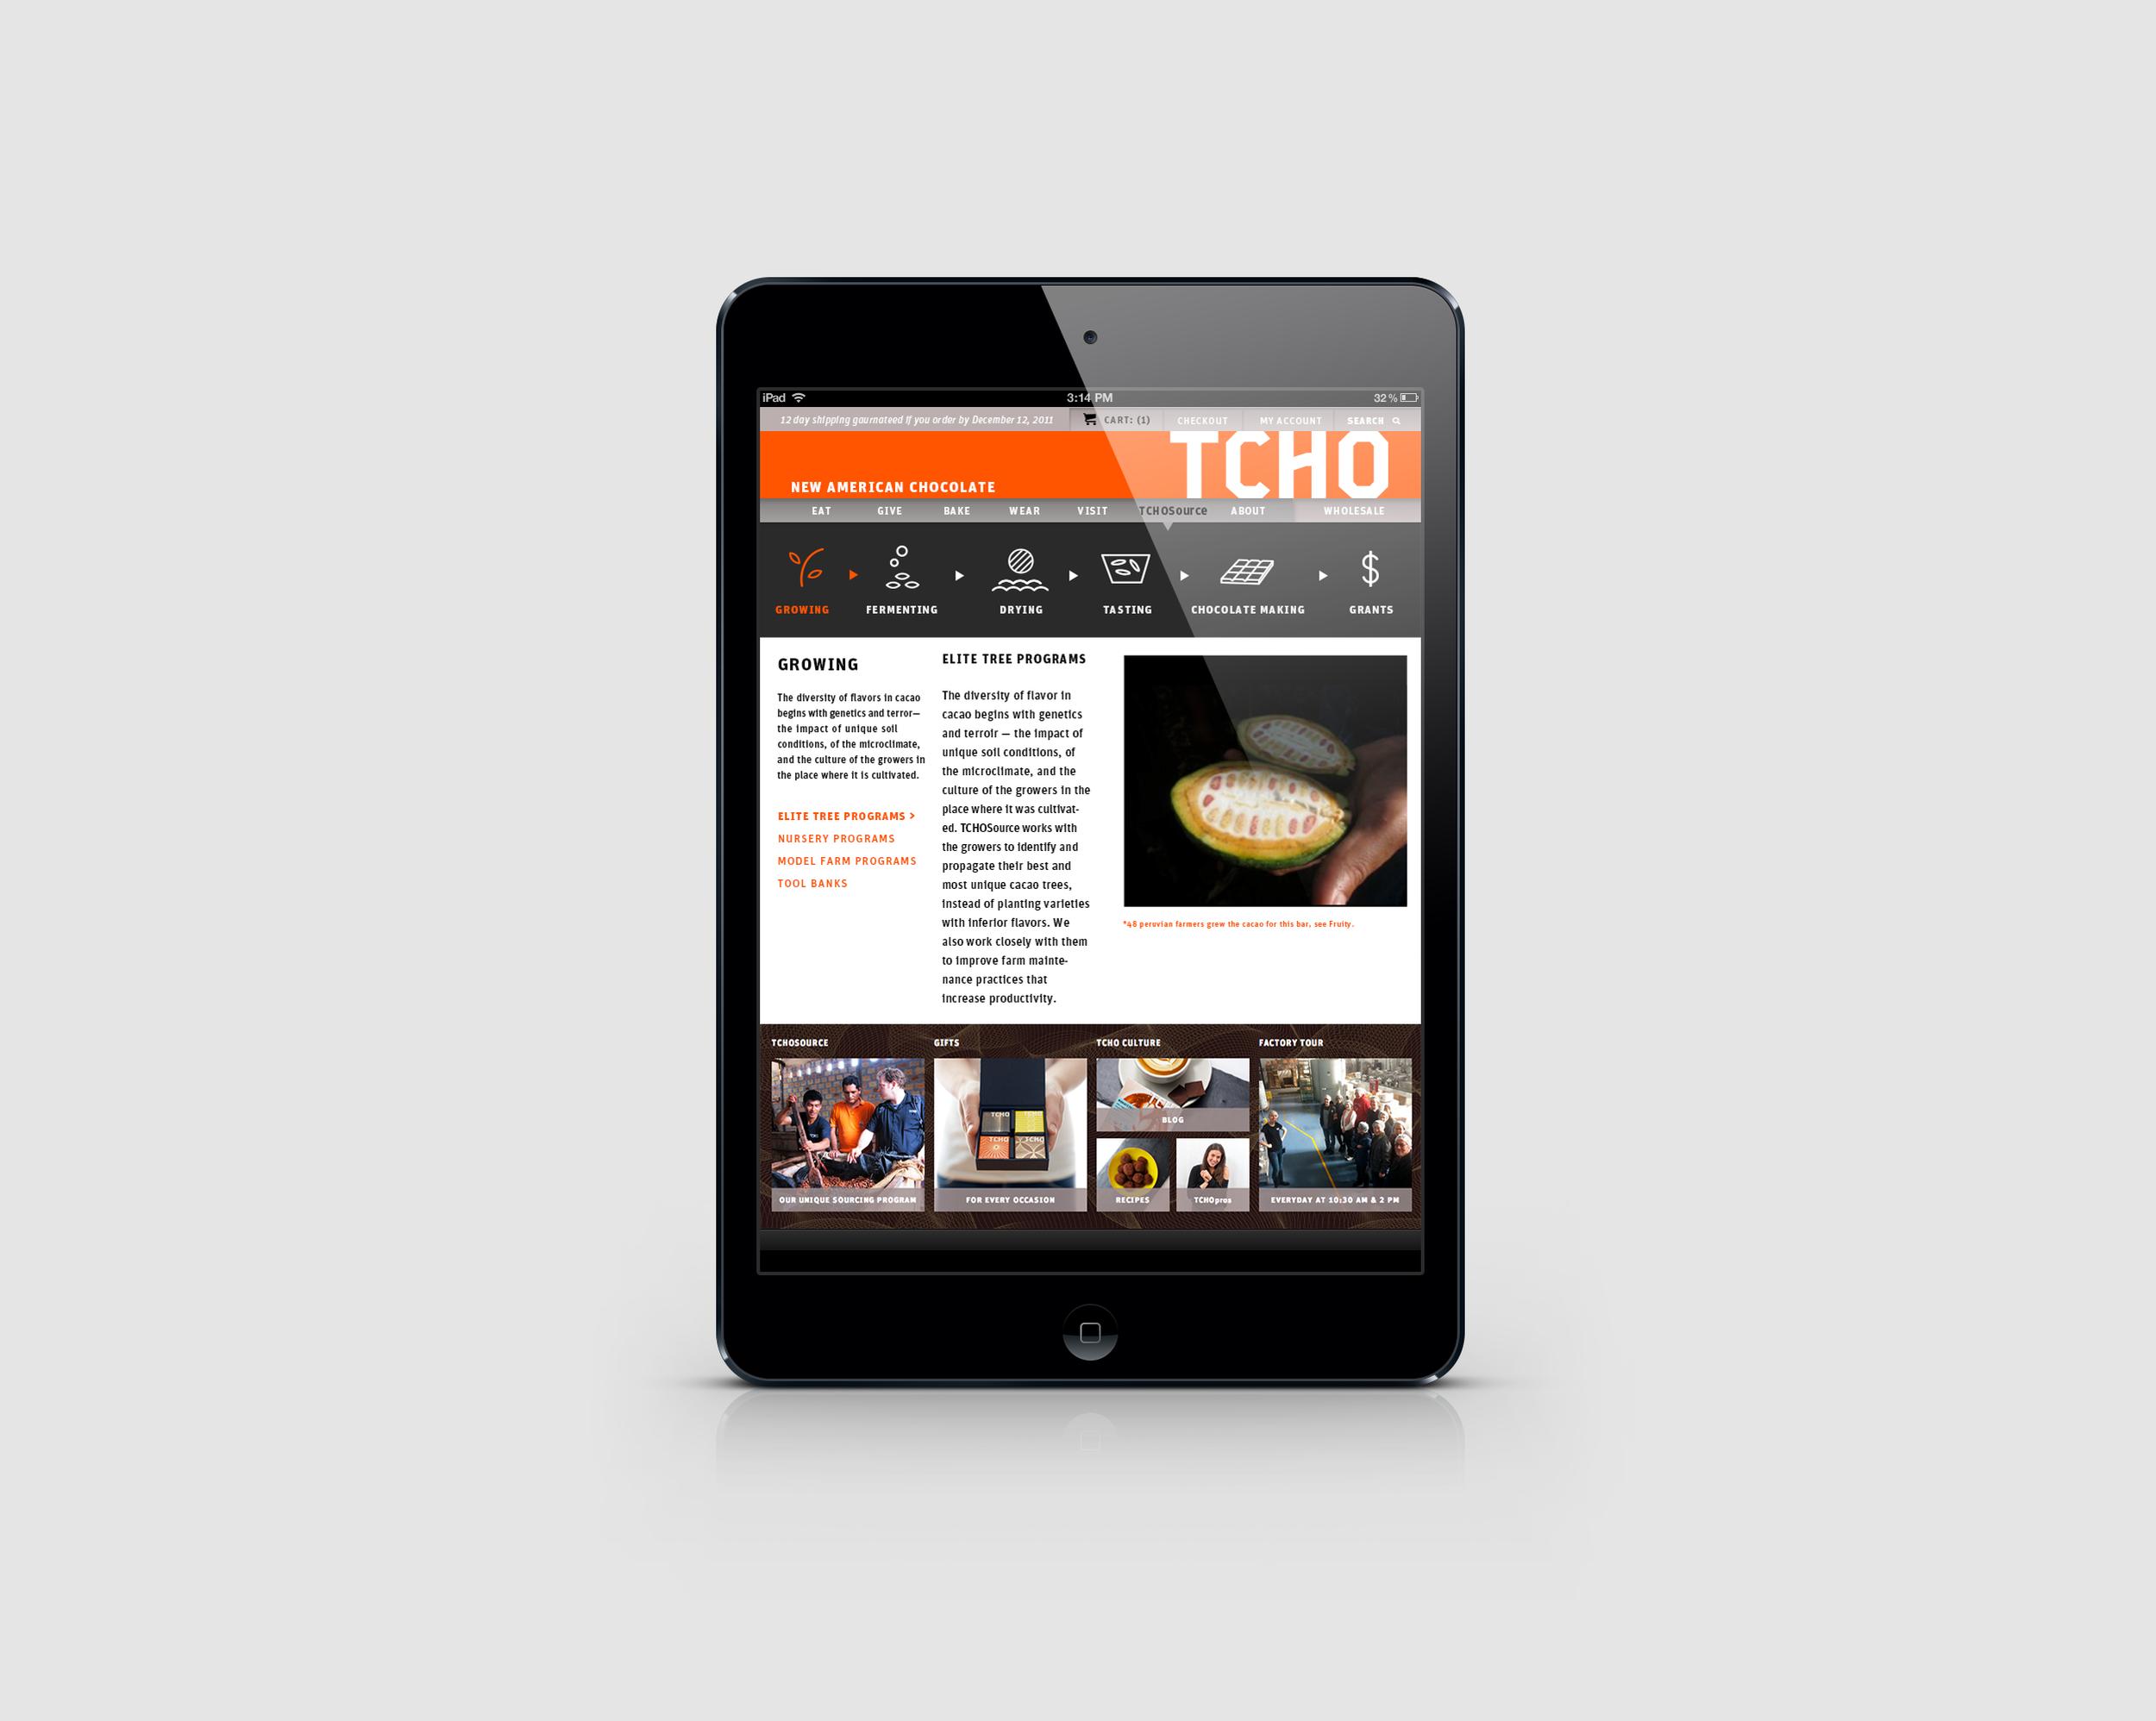 TCHOSource Website IPad